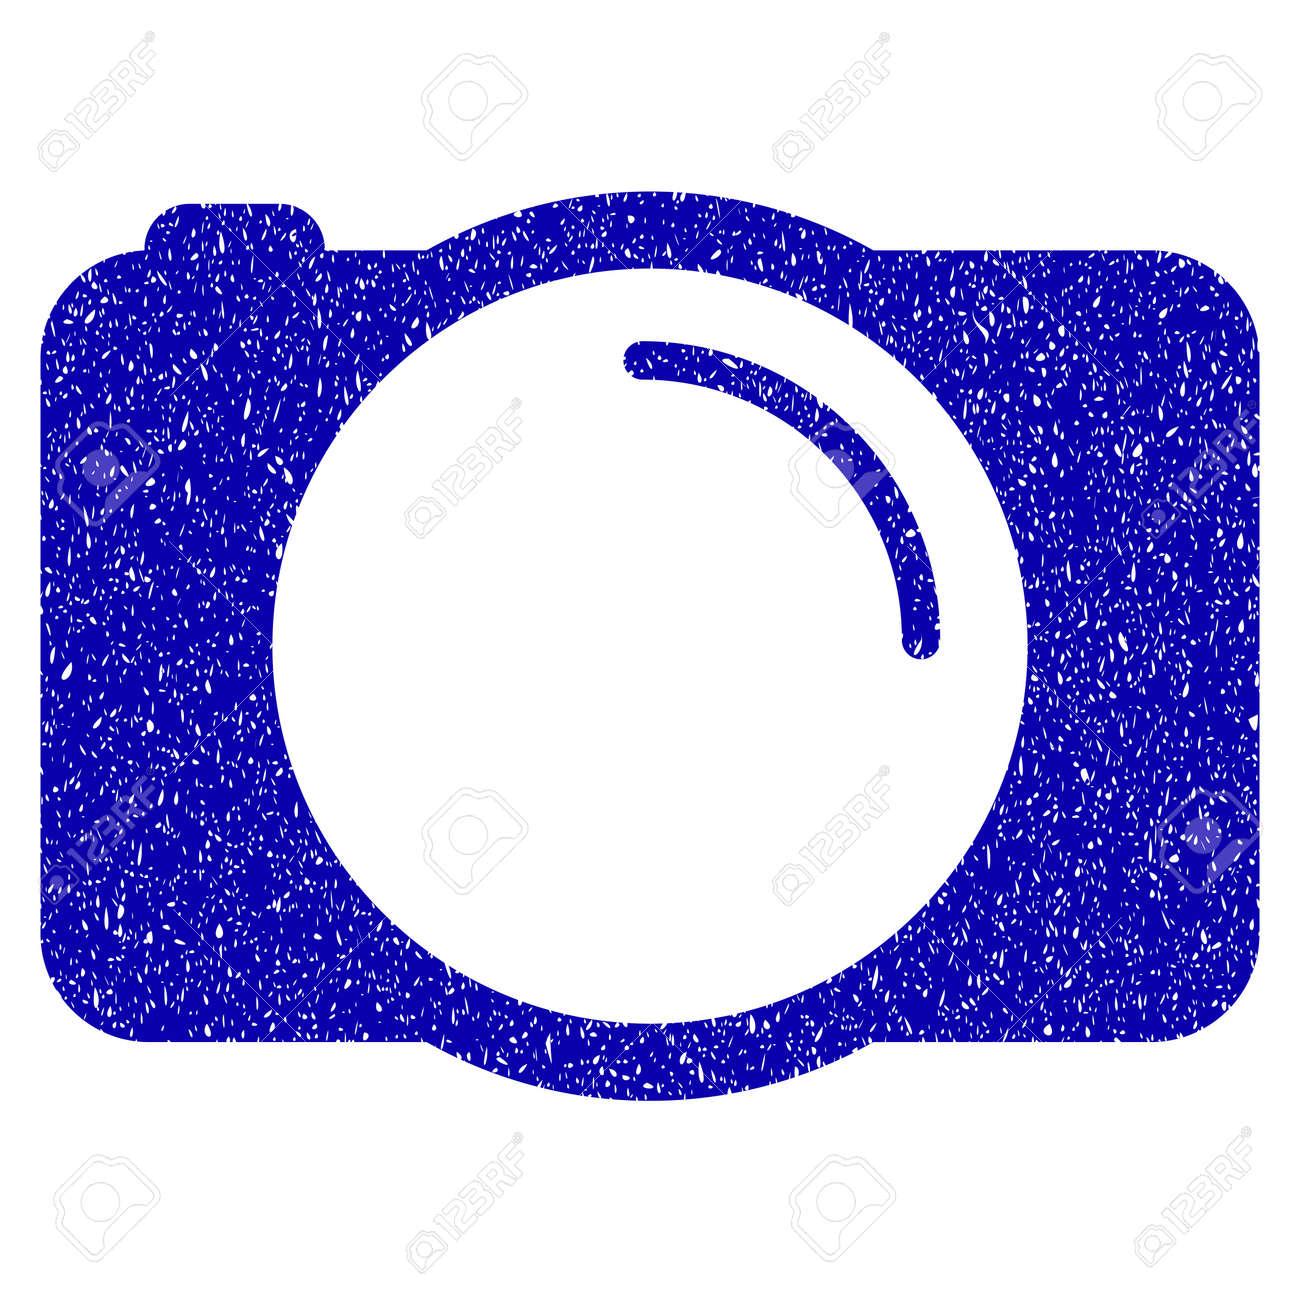 Foto De Grunge Cámara Sello De Goma Marca De Agua Del Sello Símbolo Del Icono Con Diseño Grunge Y Textura Sucia Etiqueta Azul Raster Borrosa